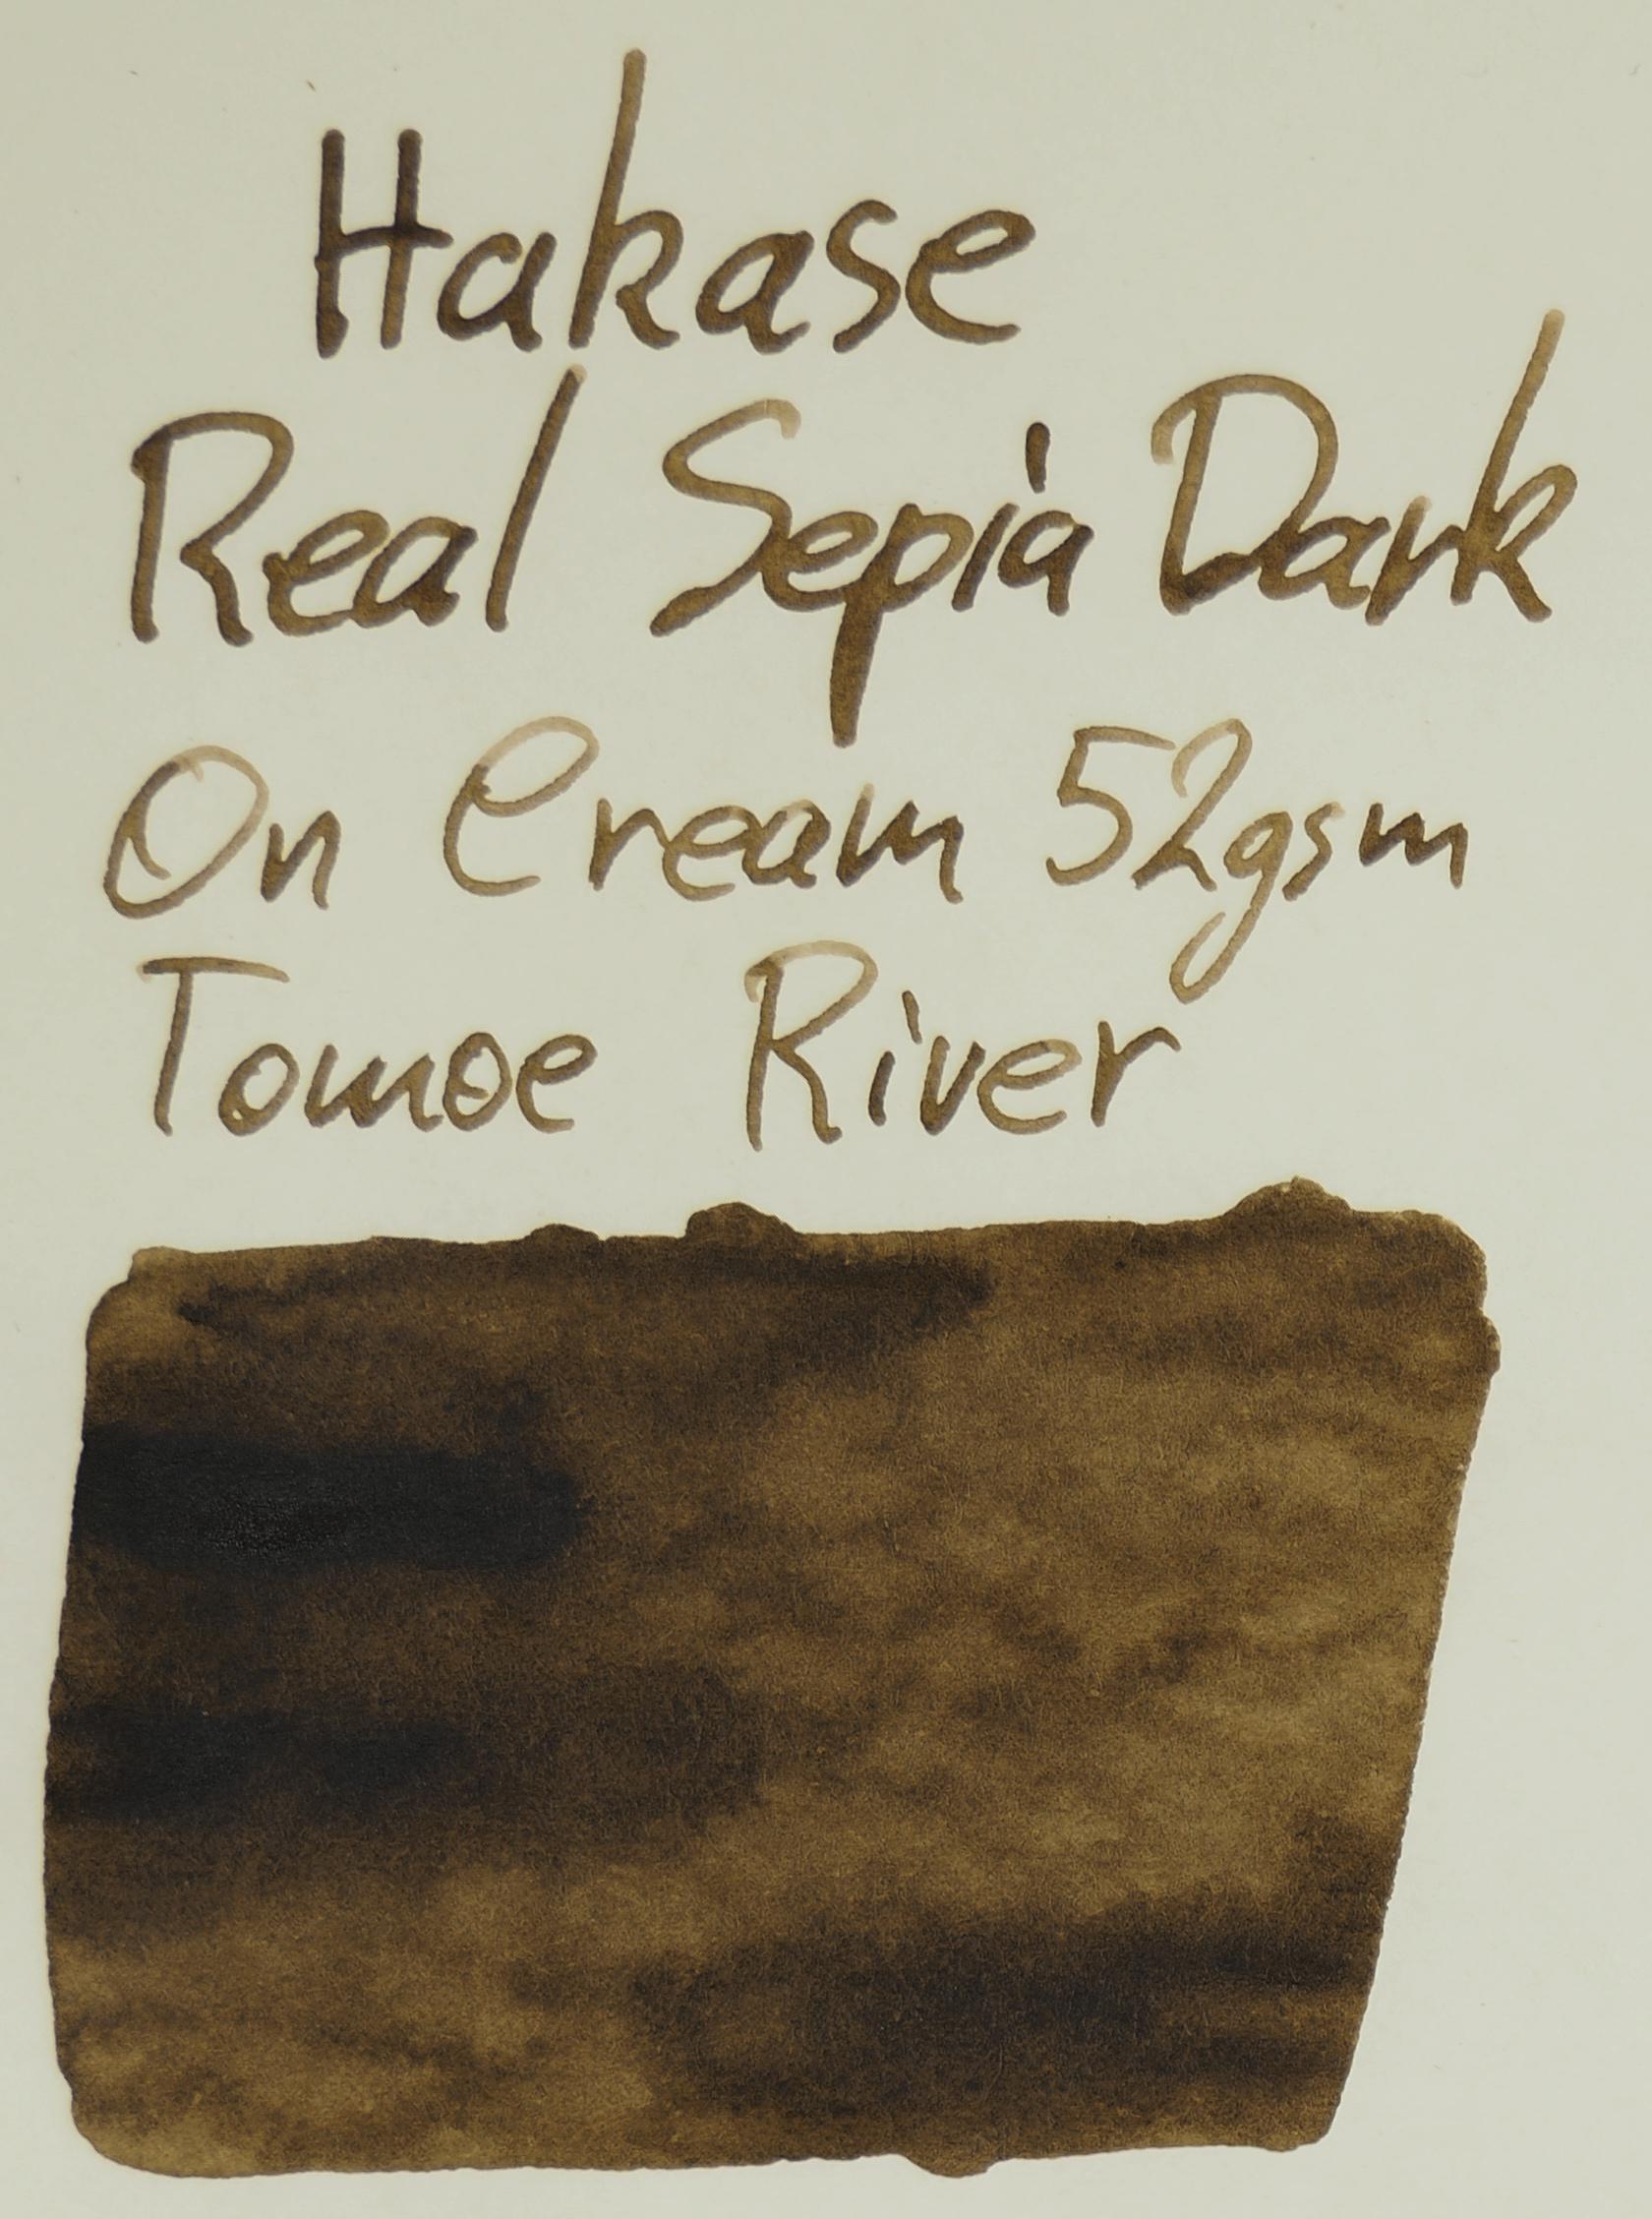 Cream 52gsm Tomoe River